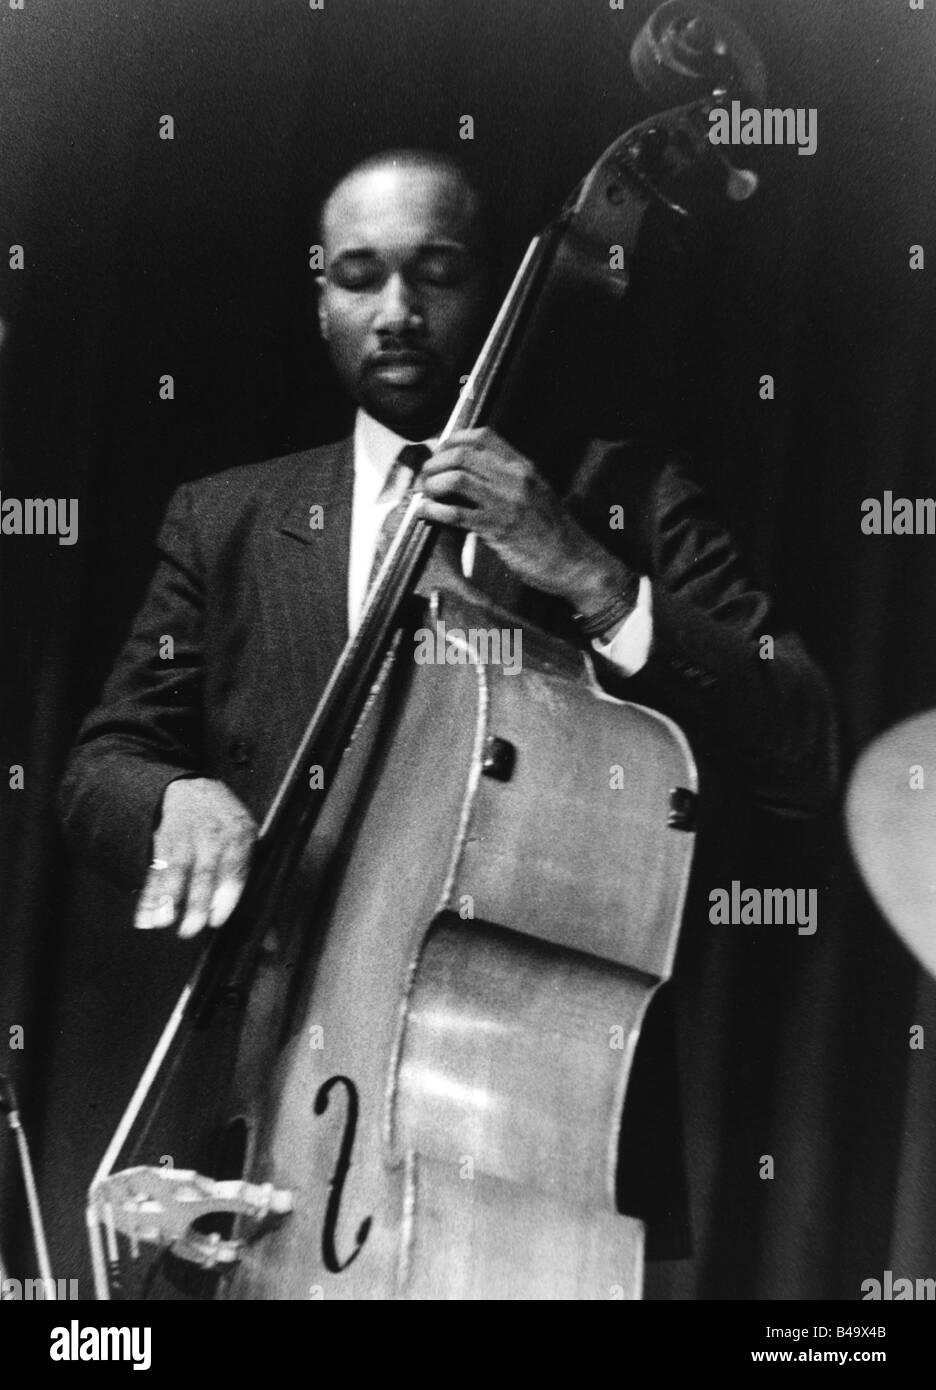 Chambers, Jeff, American musician (Jazz), half length, playing contrabass, live performance, Karlsruhe, June 1993, - Stock Image